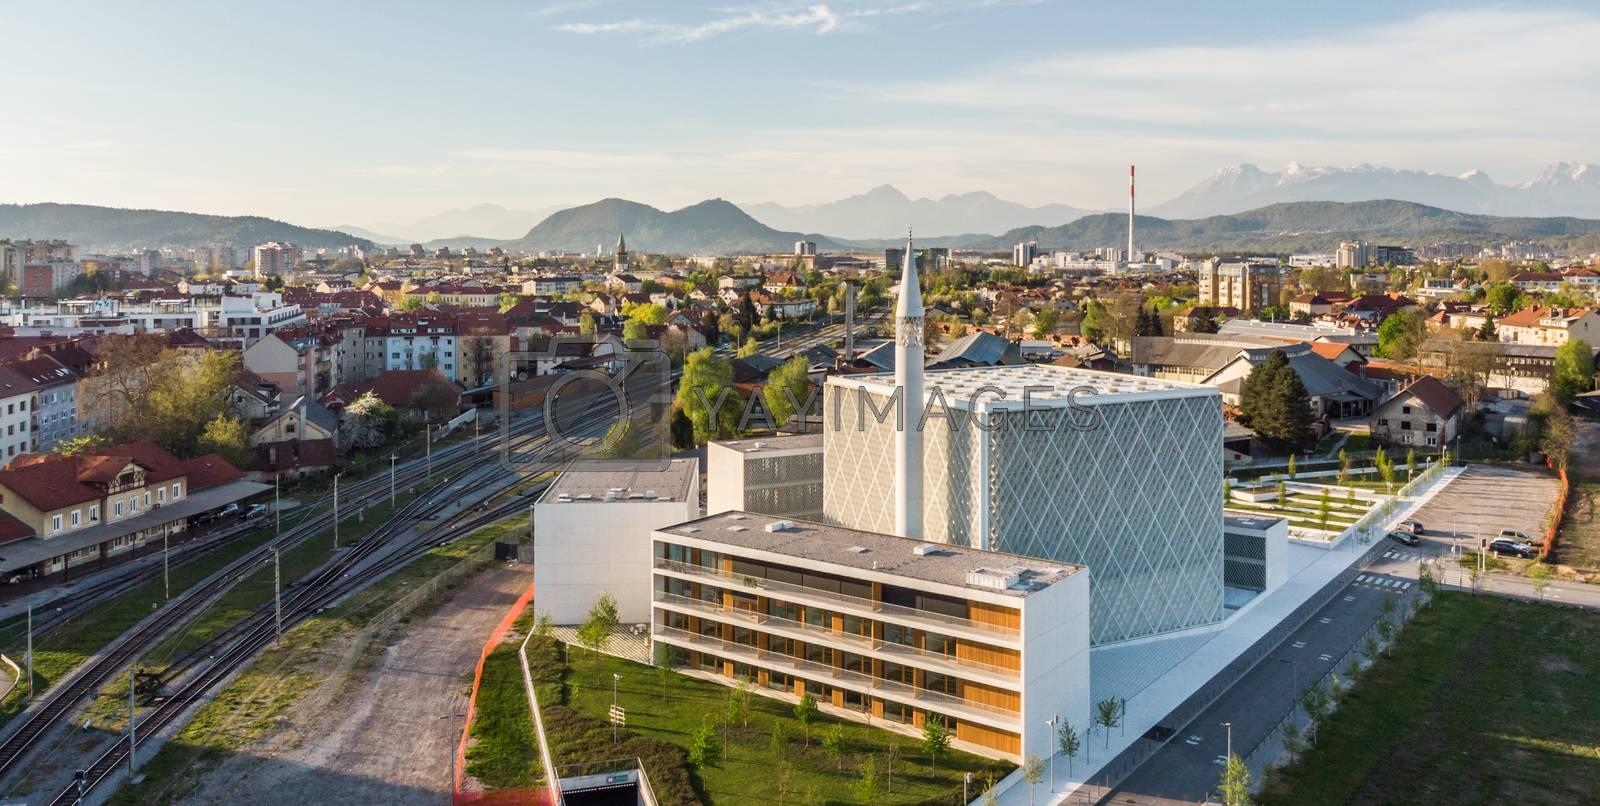 Modern archiecture of islamic religious cultural centre under construction in Ljubljana, Slovenia, Europe.